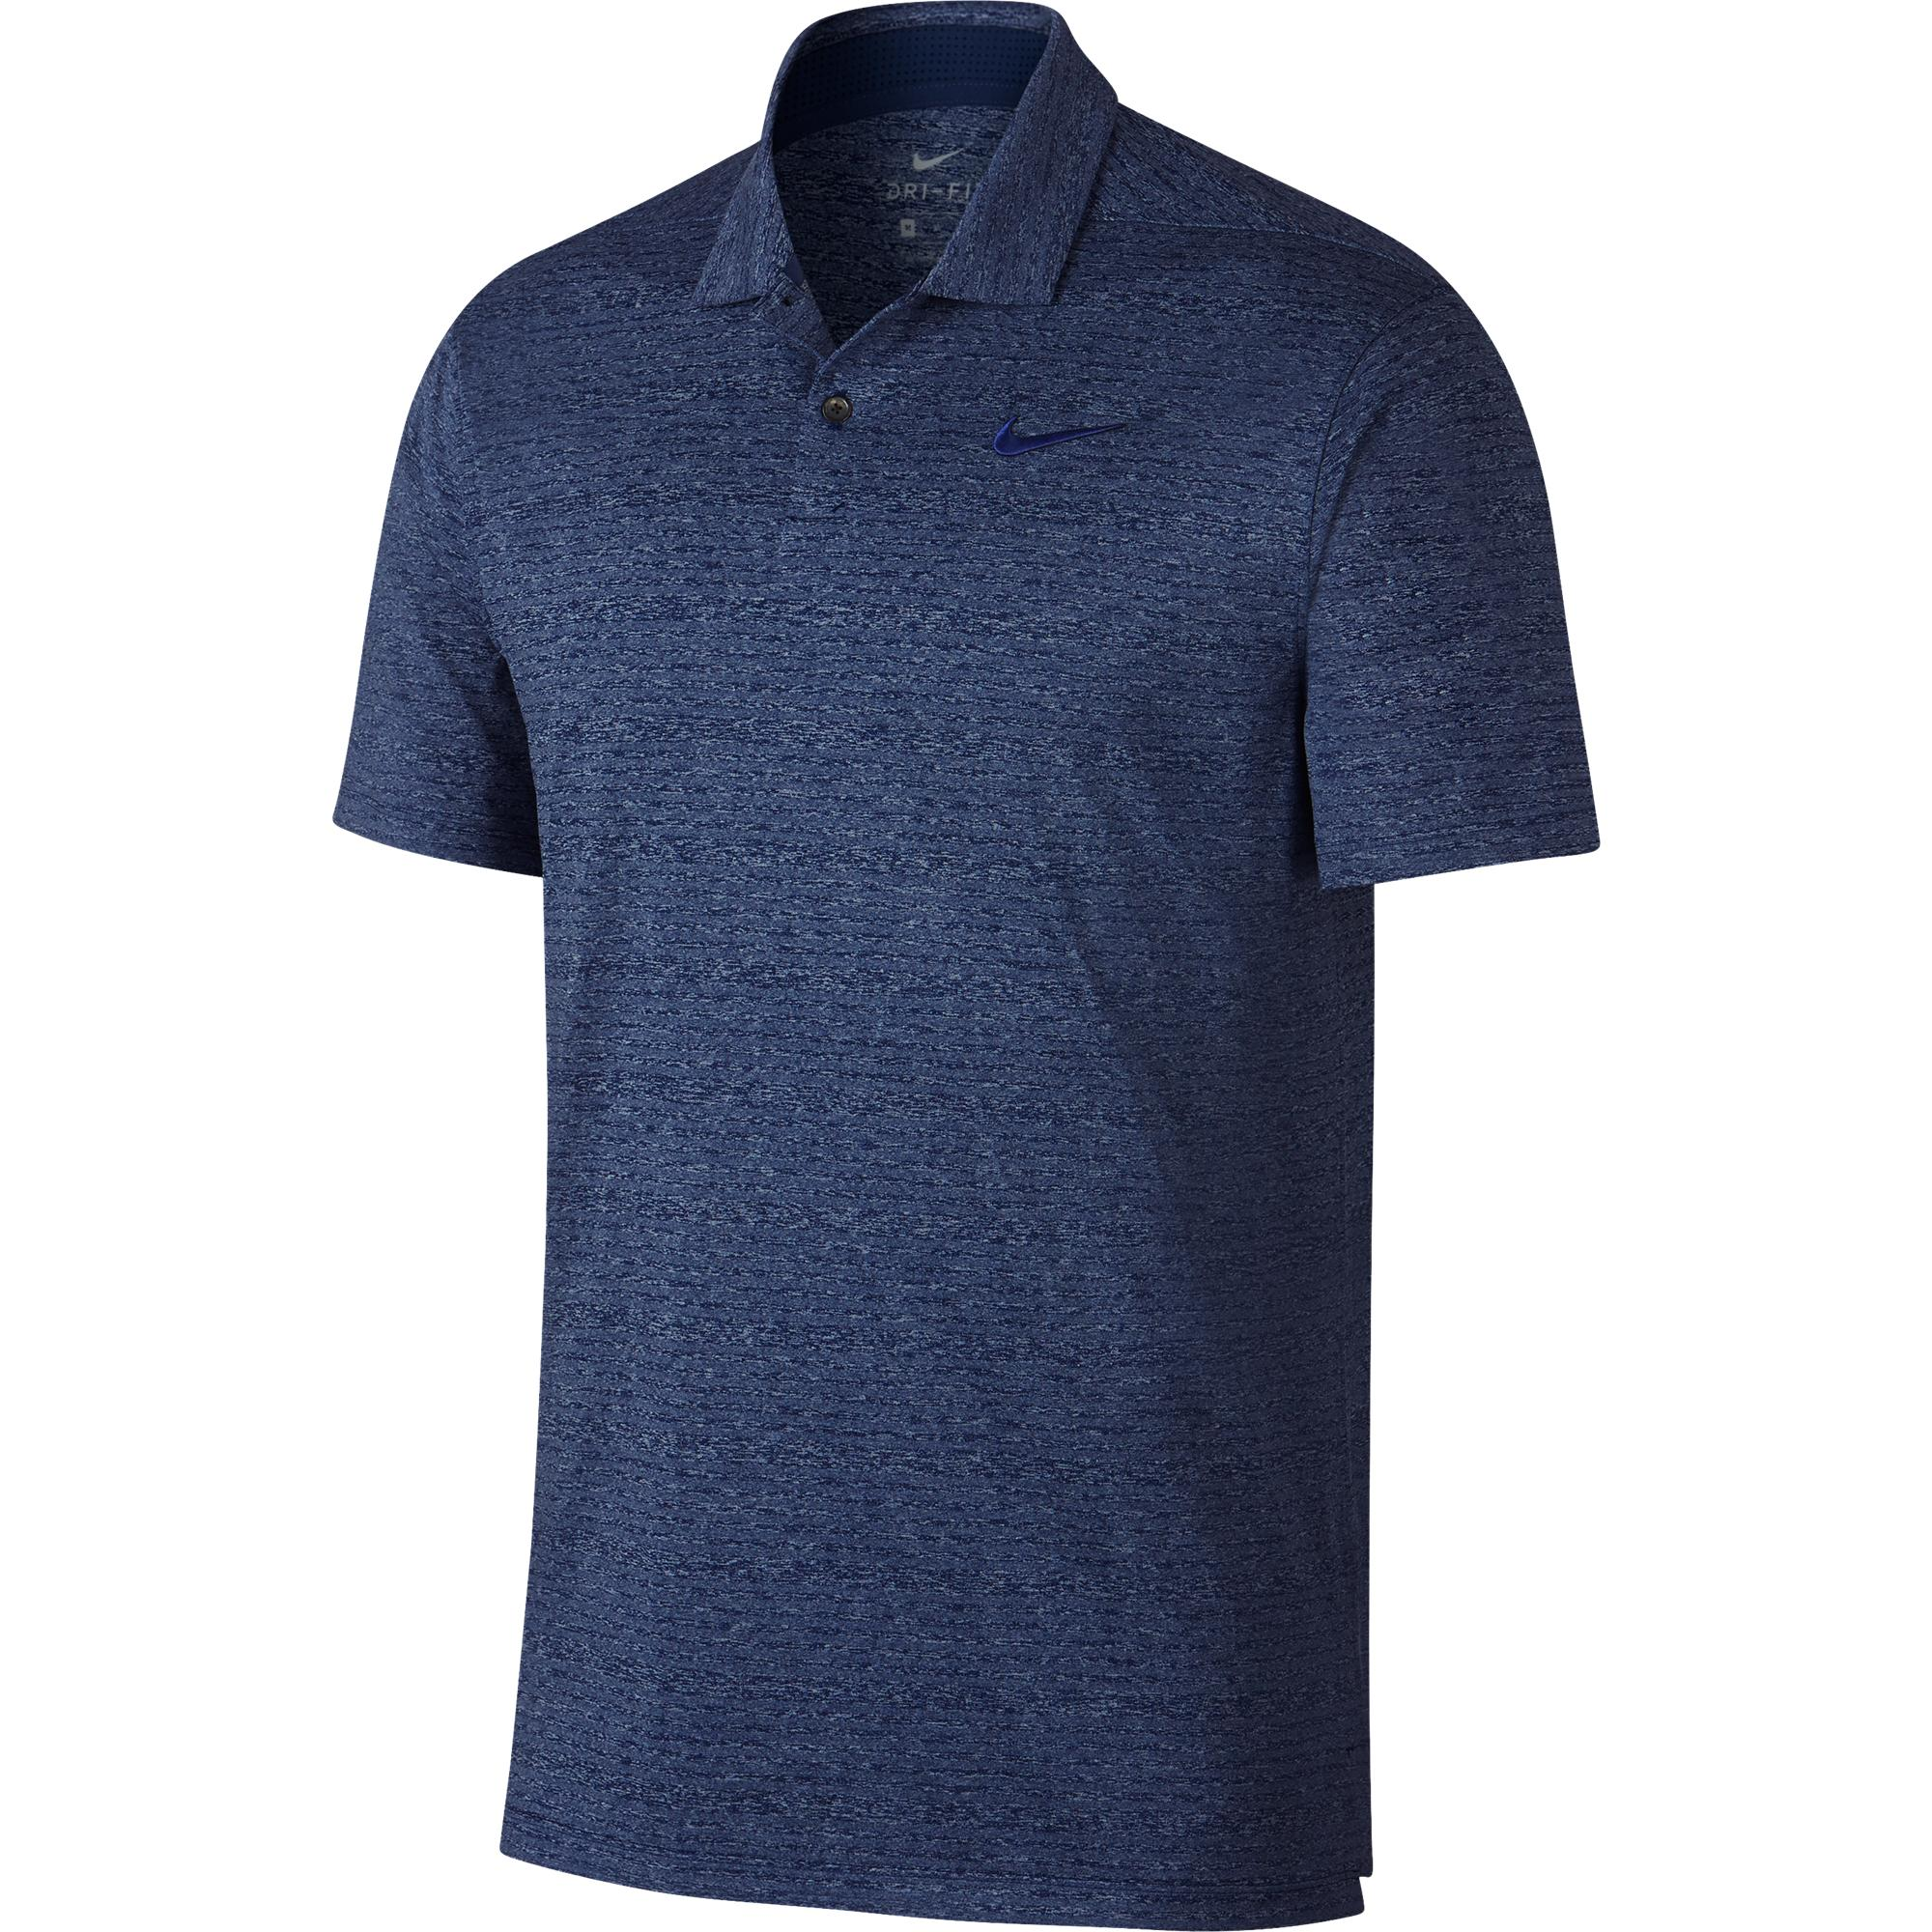 Men's Dri-Fit Vapor Heather Short Sleeve Shirt